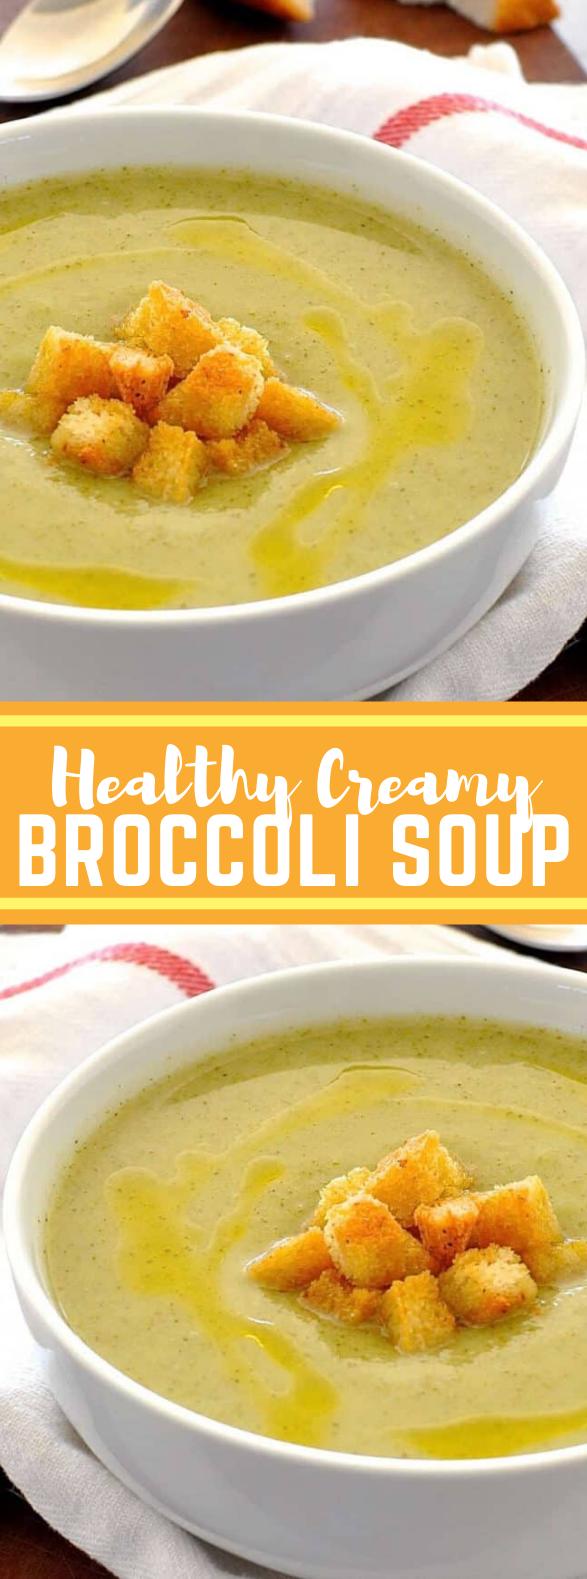 Healthy Creamy Broccoli Soup #vegan #lowcalorie